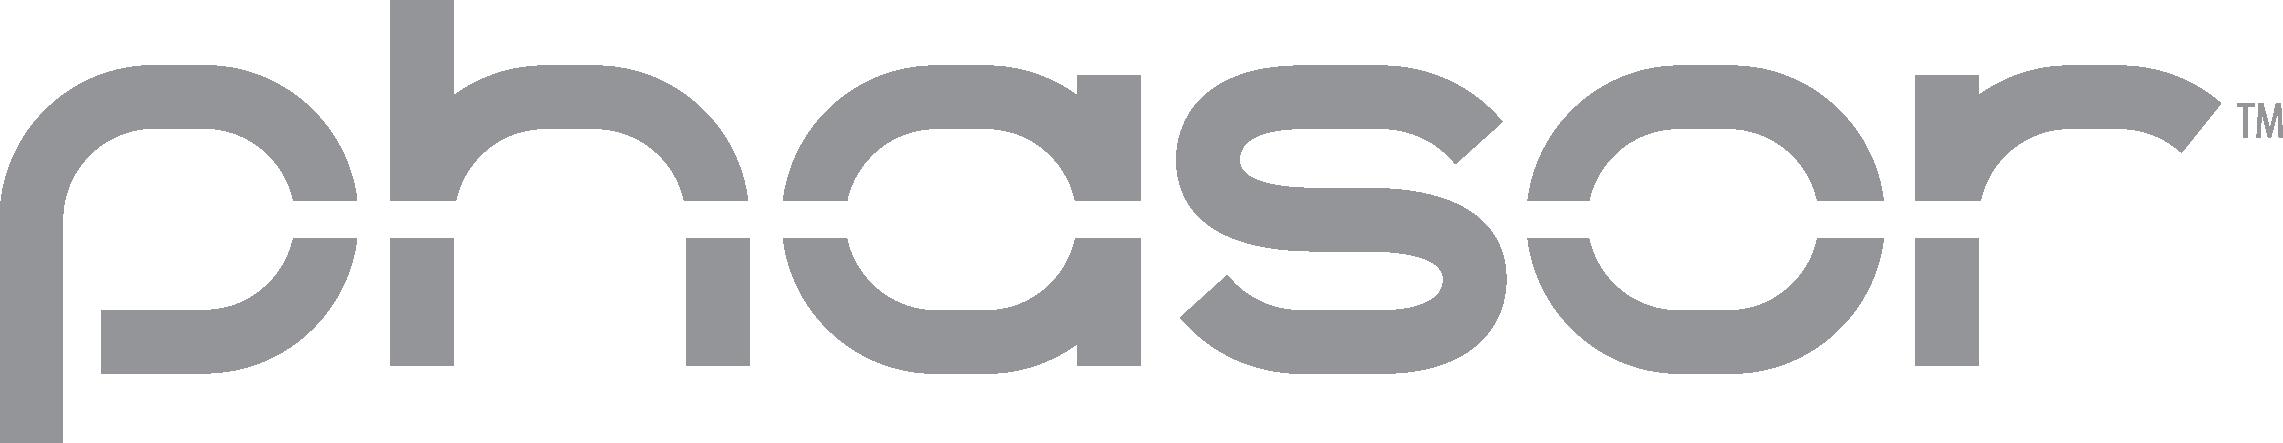 Phasor logo-Vista Dental